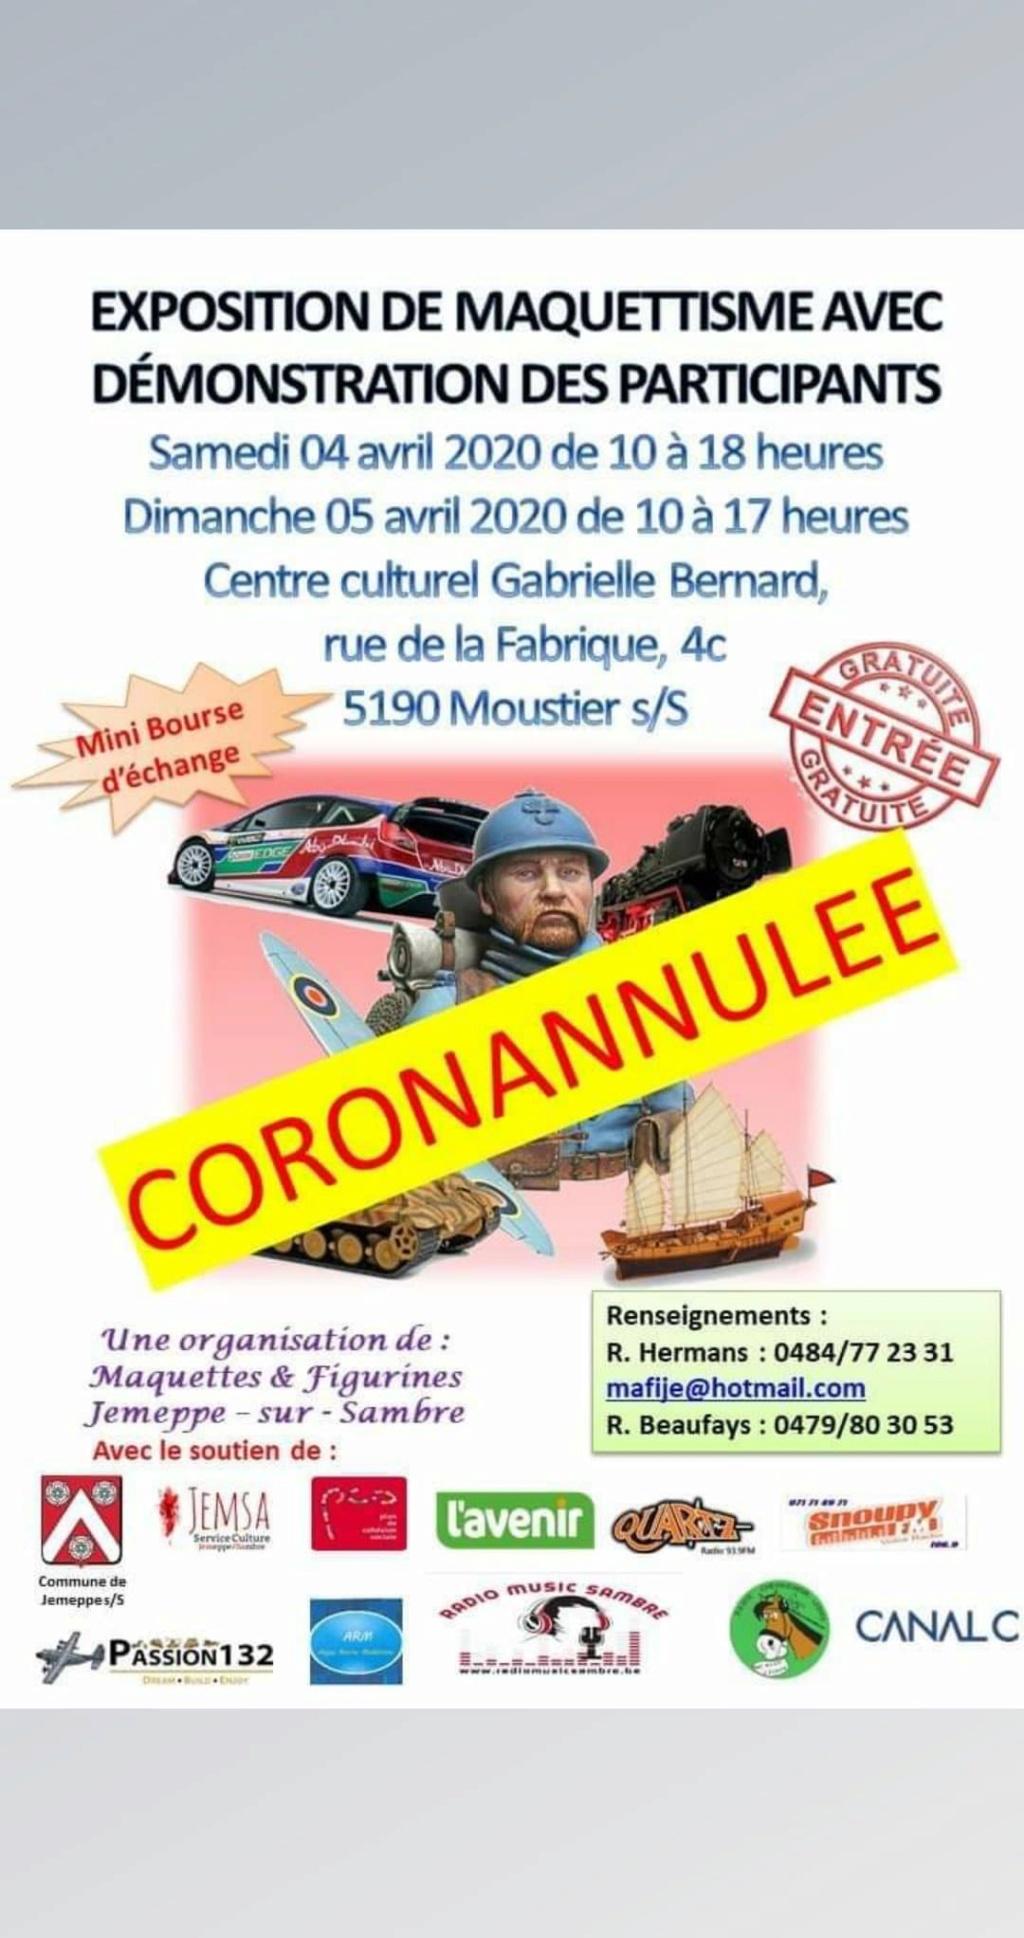 Expos & bourses - annulation & coronavirus 90631910